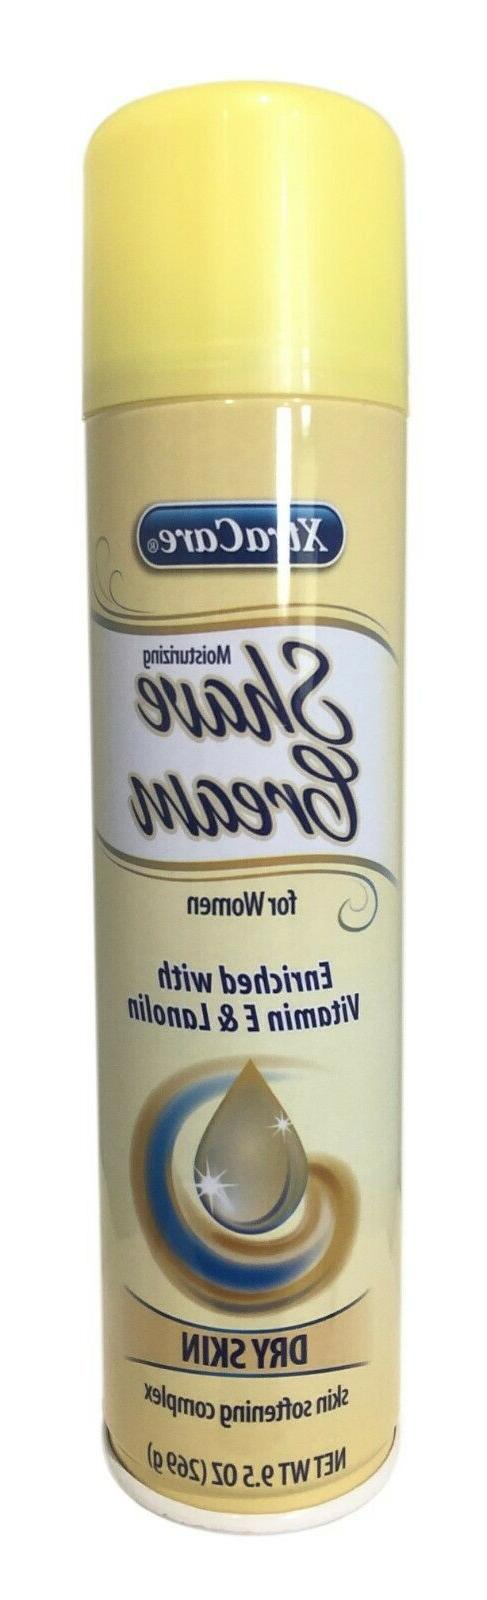 shaving cream for woman 9 5 fl